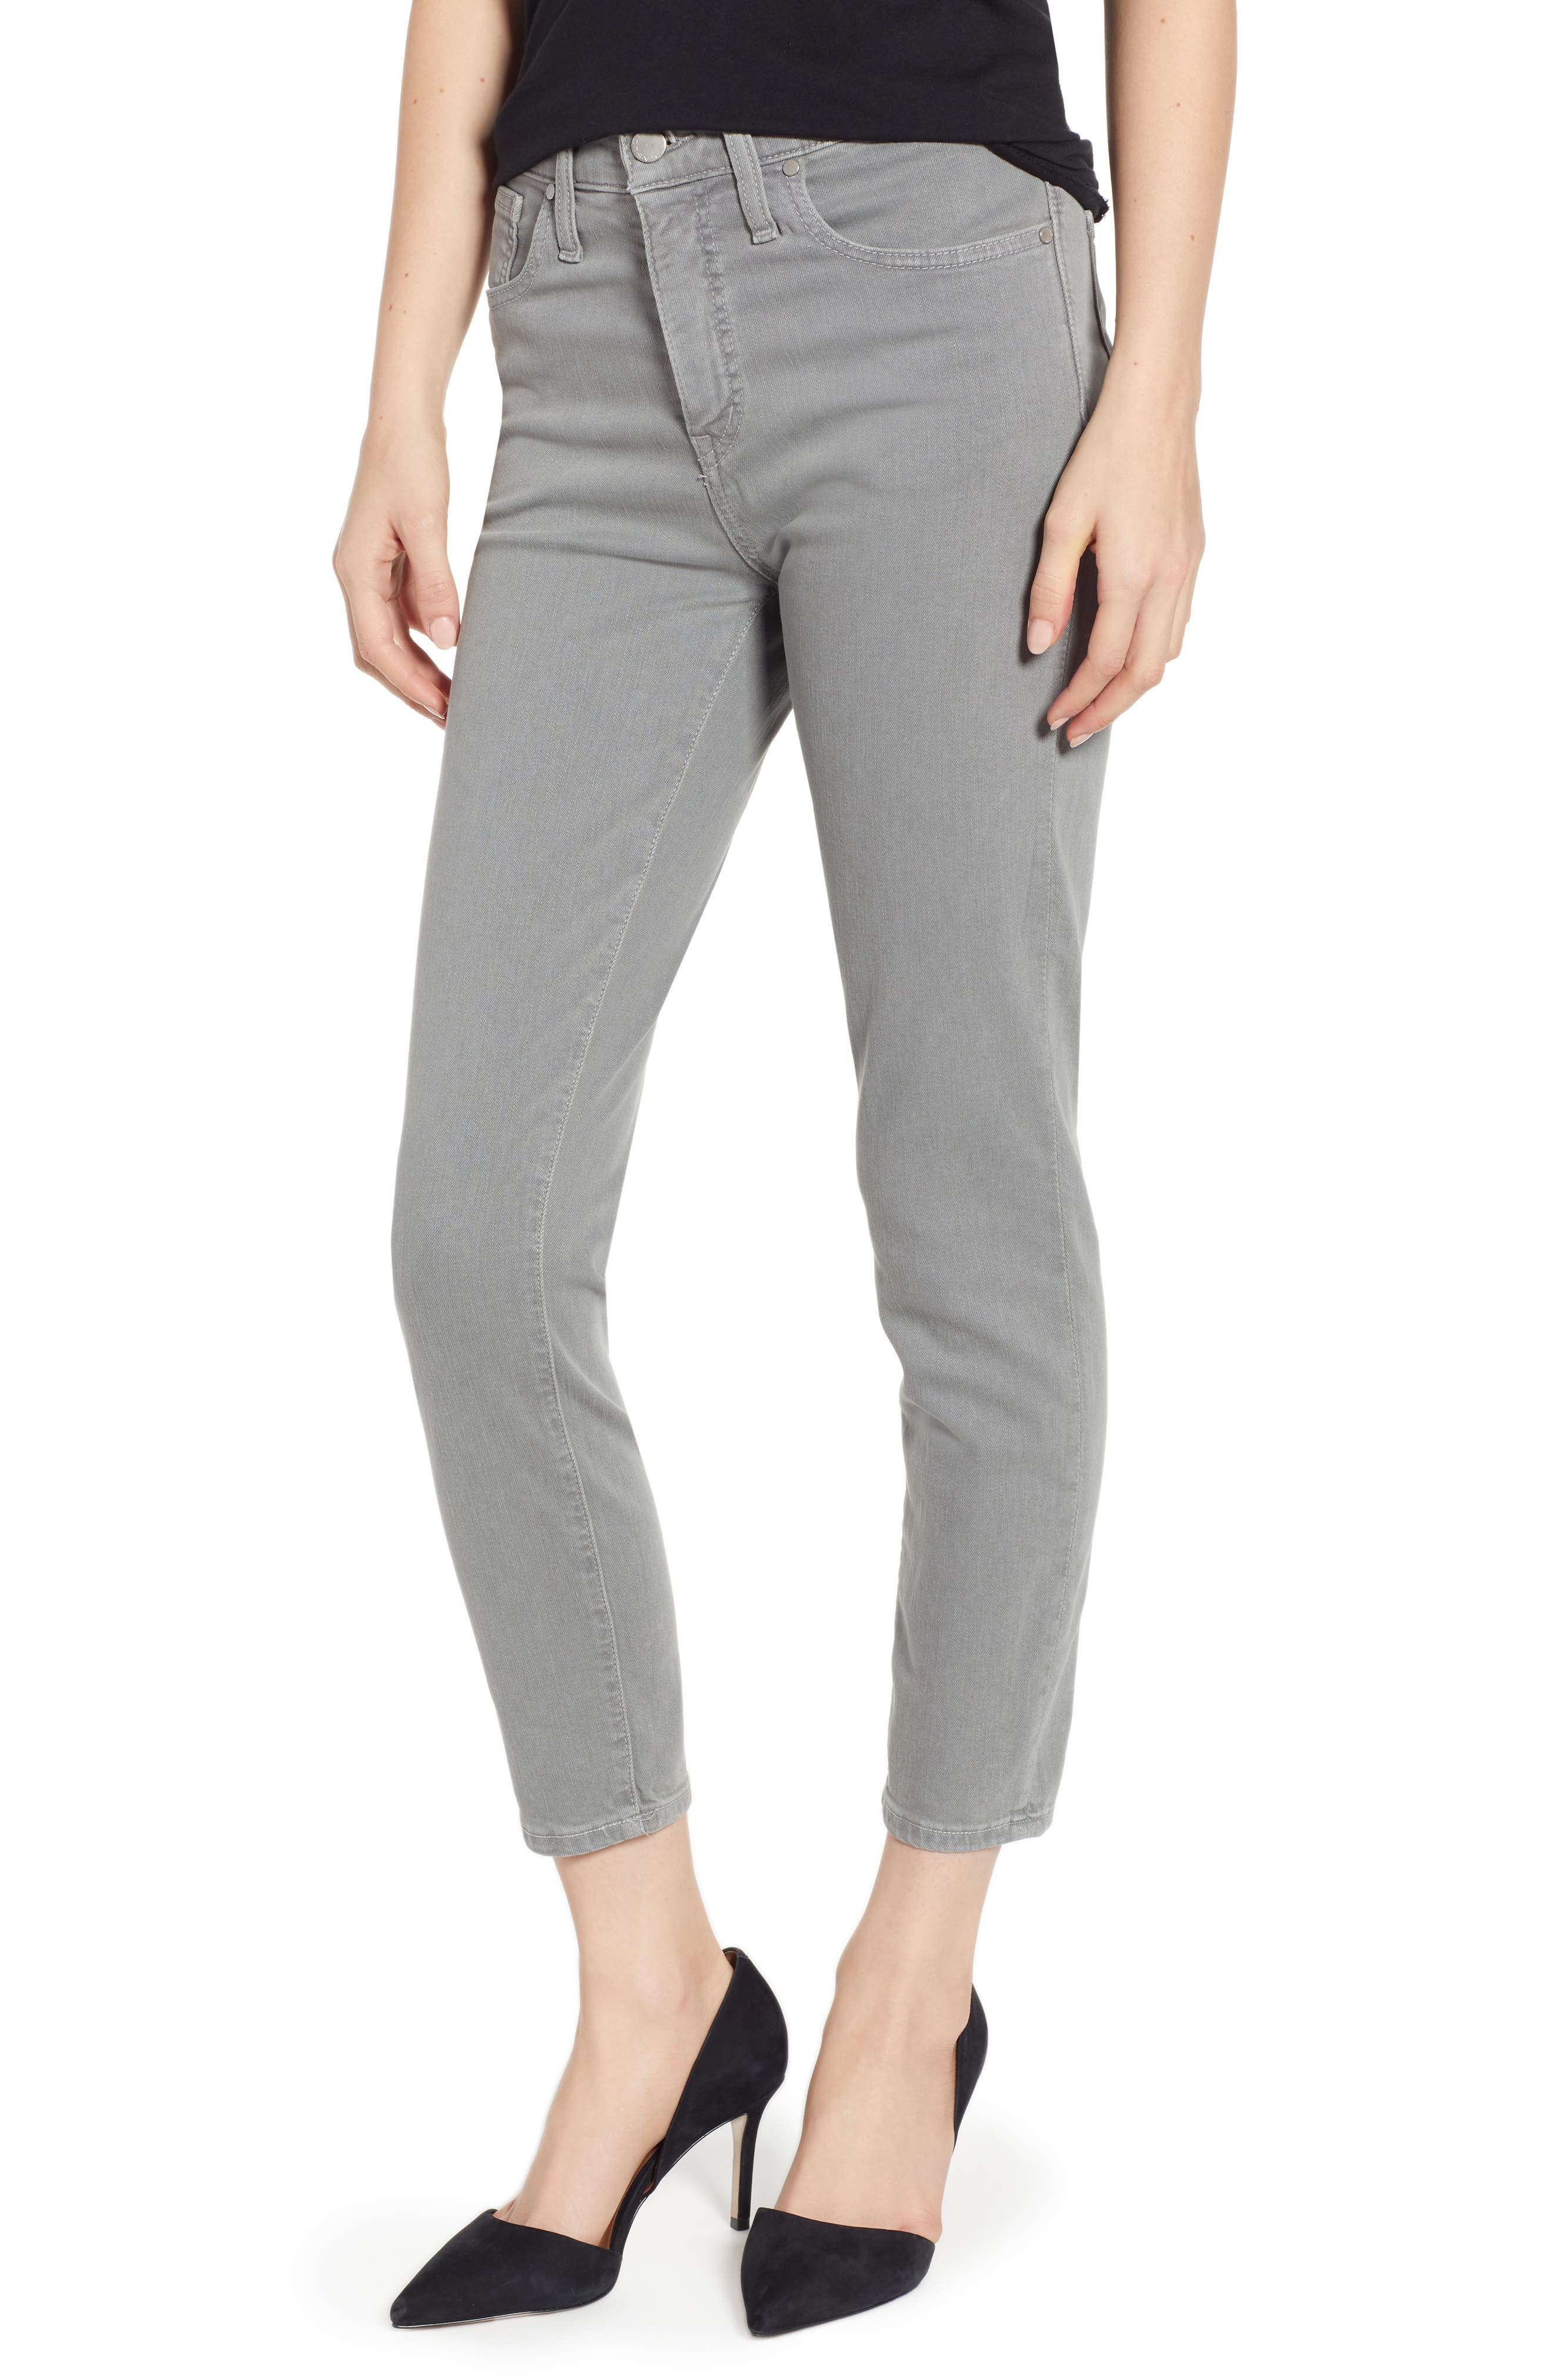 Sierra High Waist Ankle Skinny Pants,                         Main,                         color, GREY